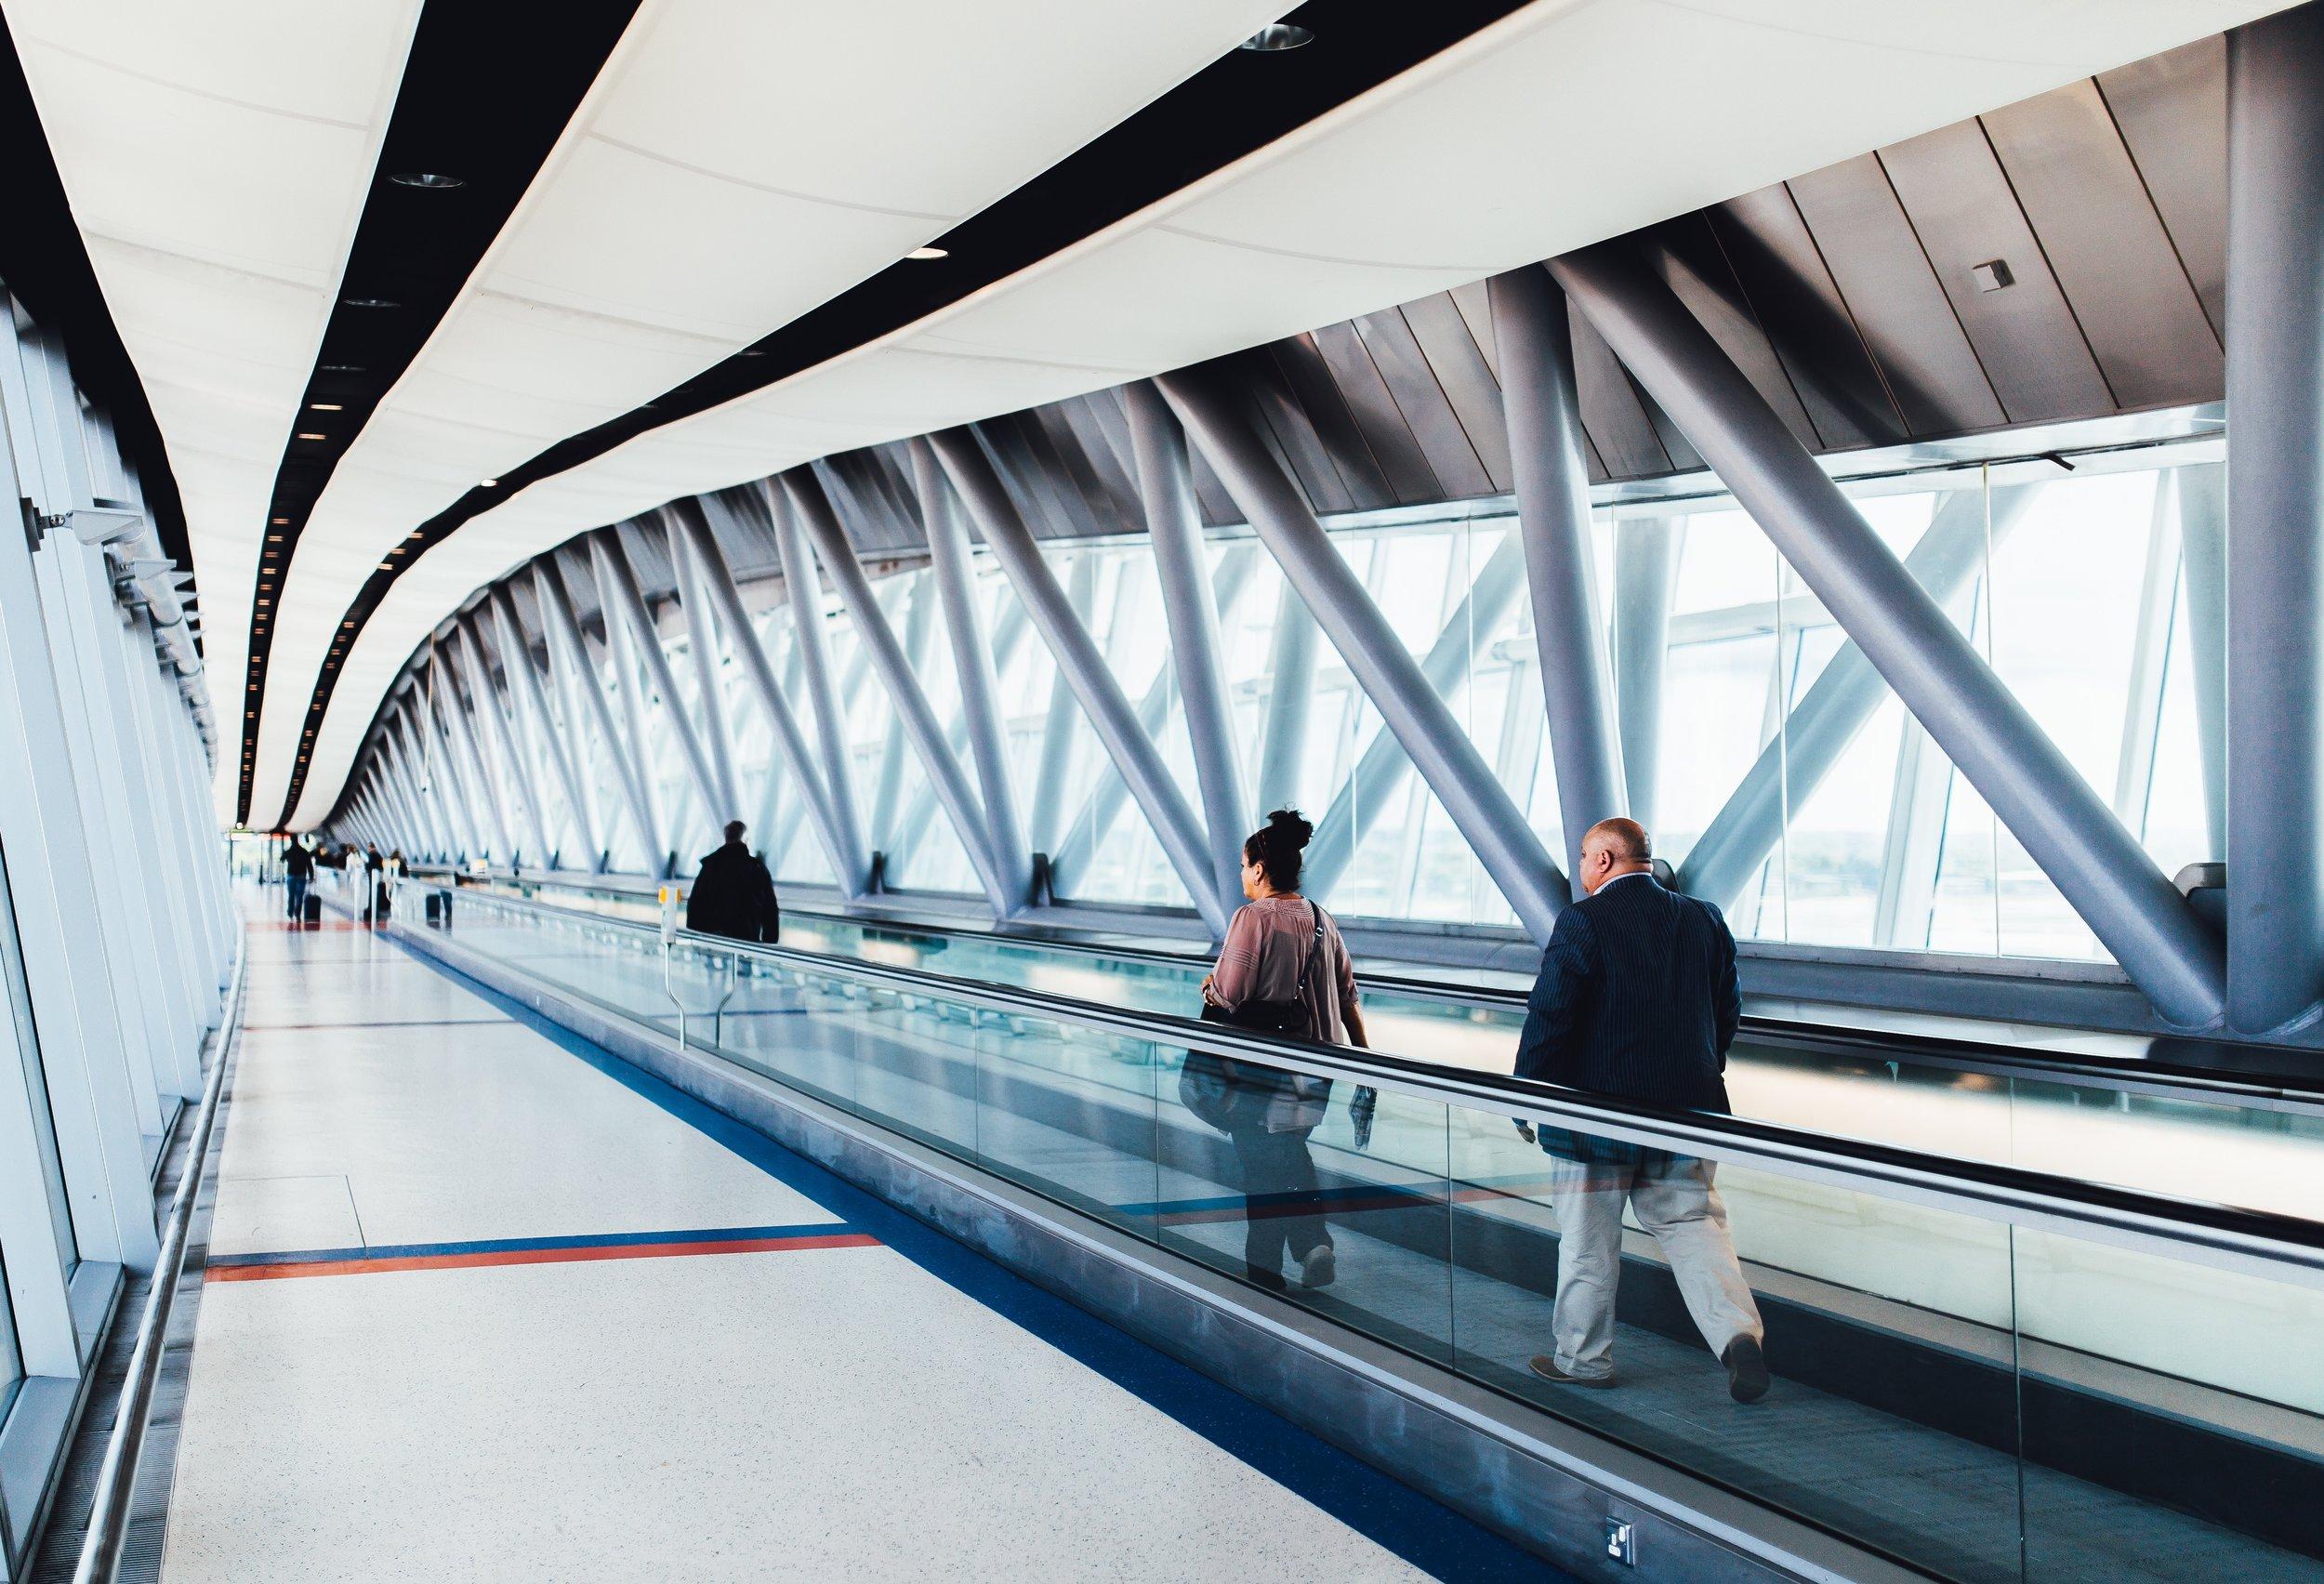 airport-airport-gate-boarding-34134.jpg